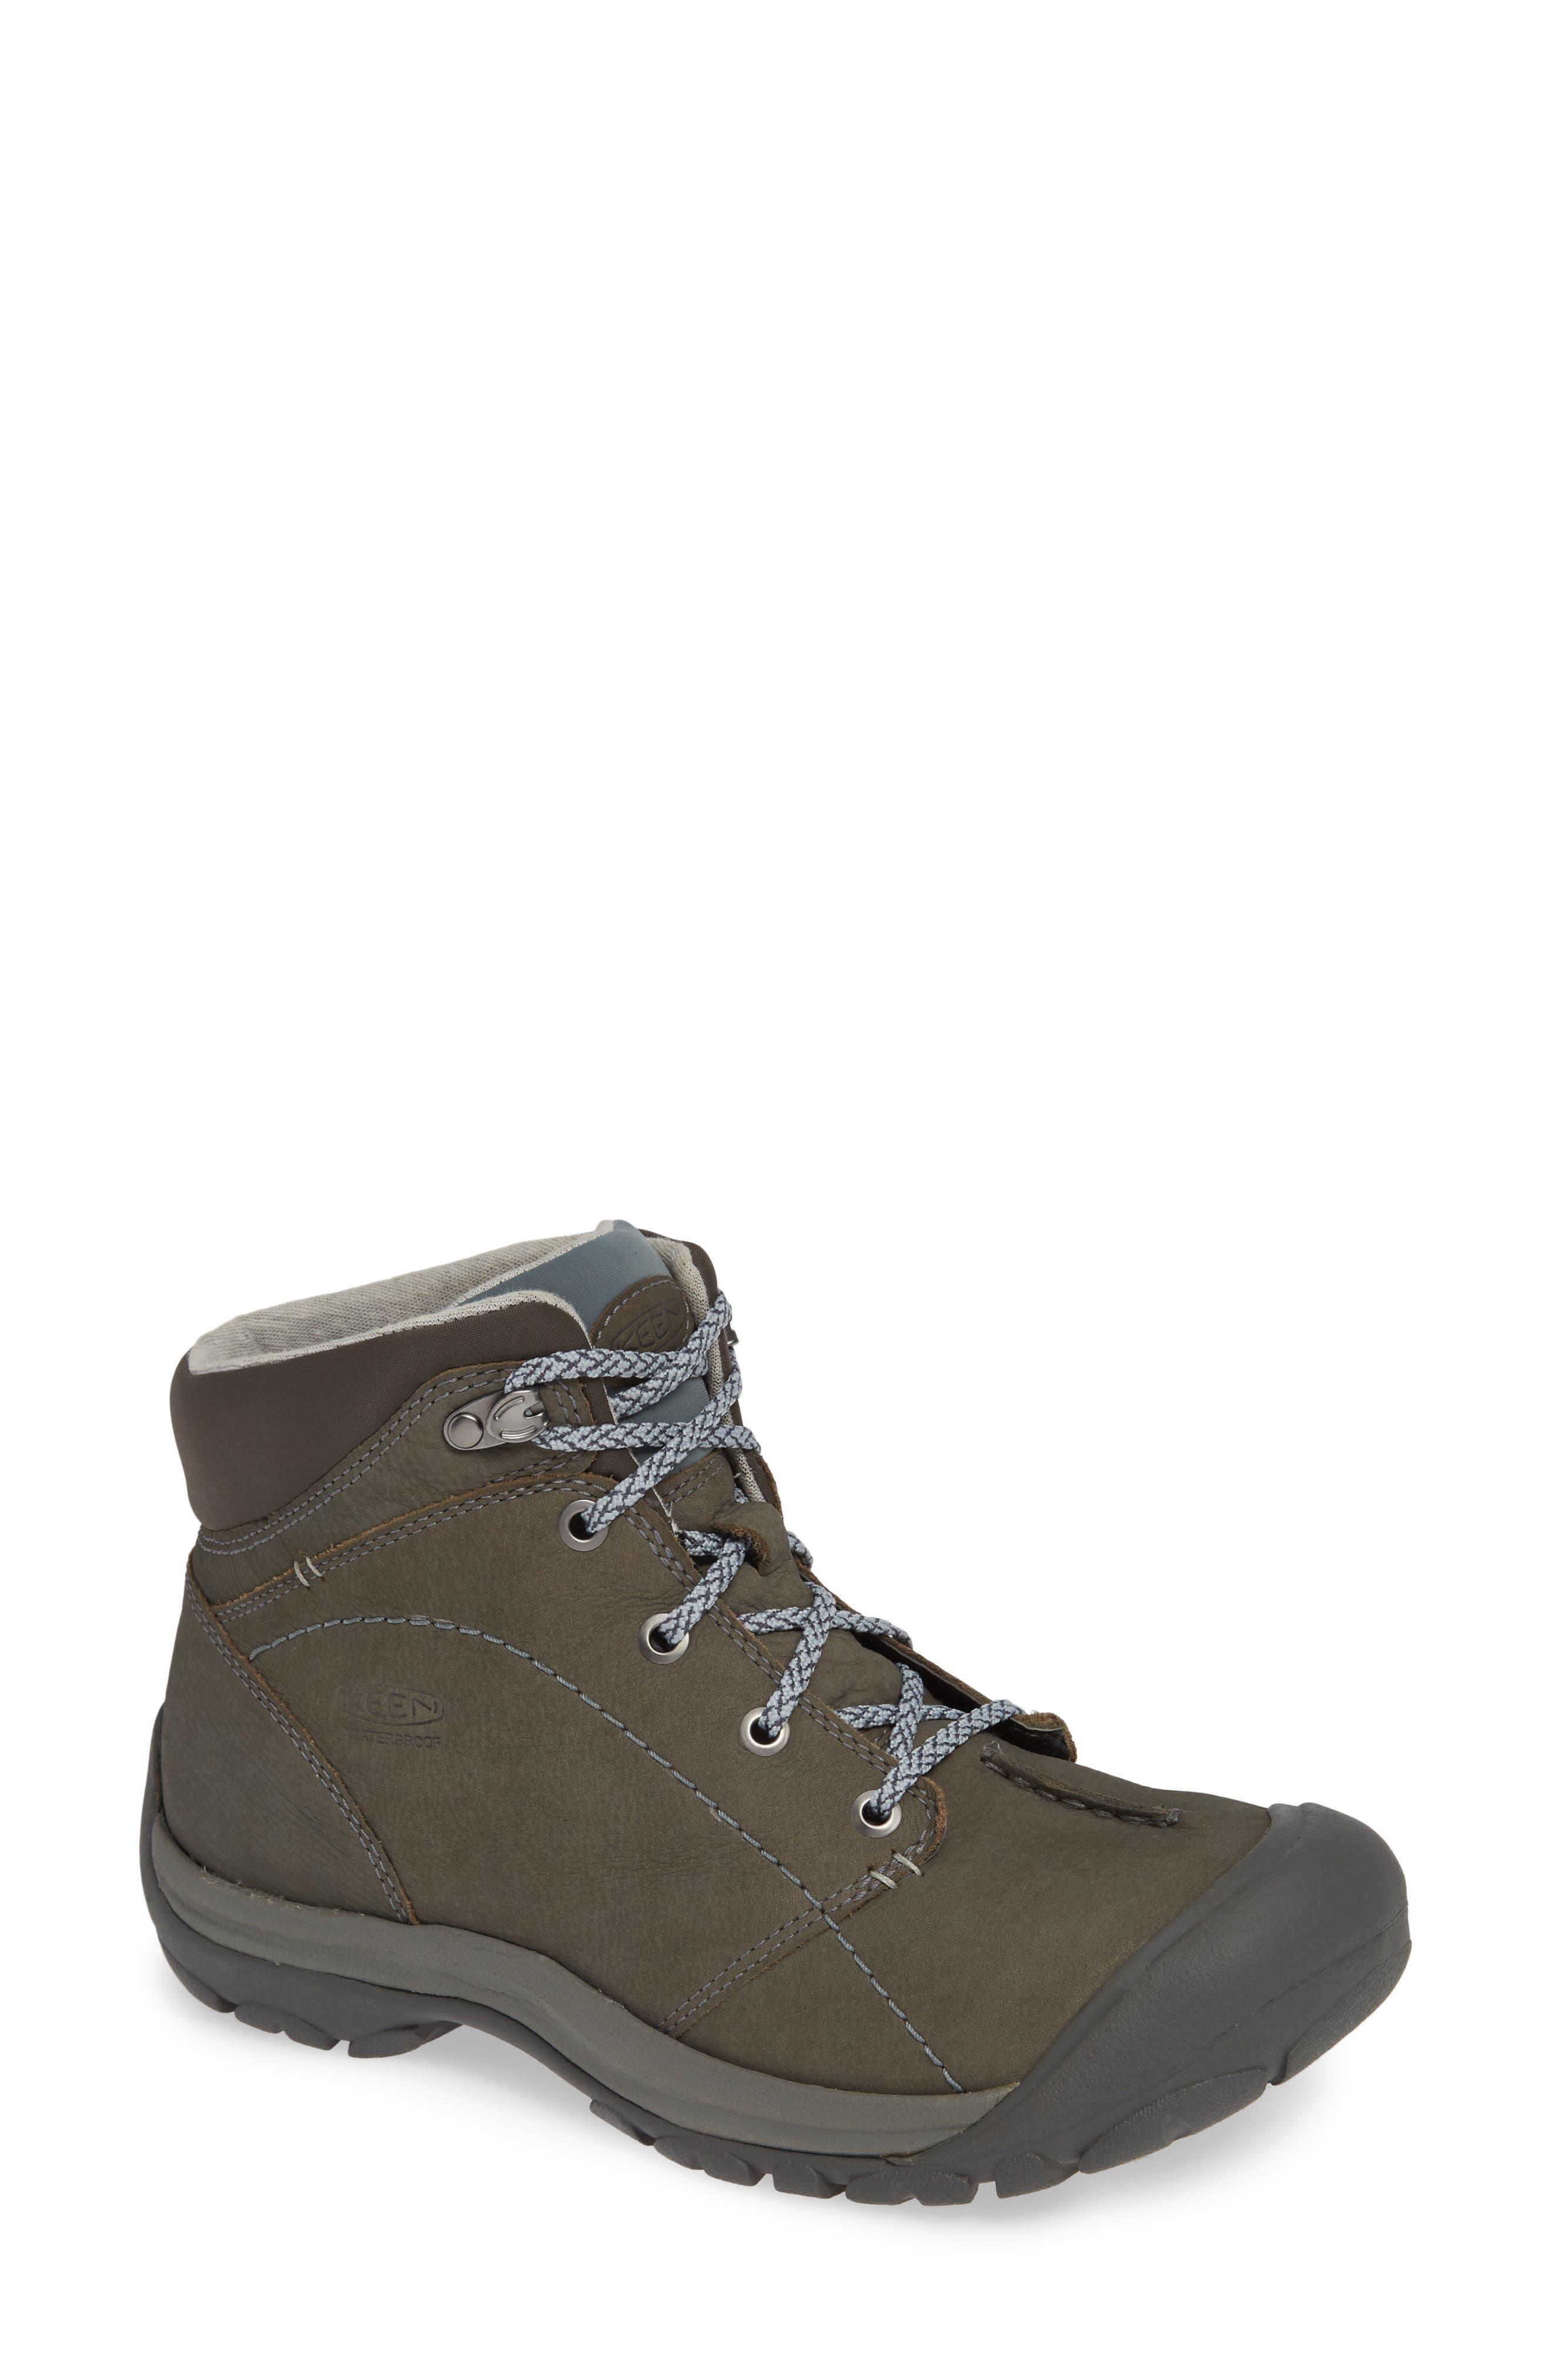 Kaci Waterproof Winter Boot,                             Main thumbnail 1, color,                             TURBULENCE/ STORMY WEATHER